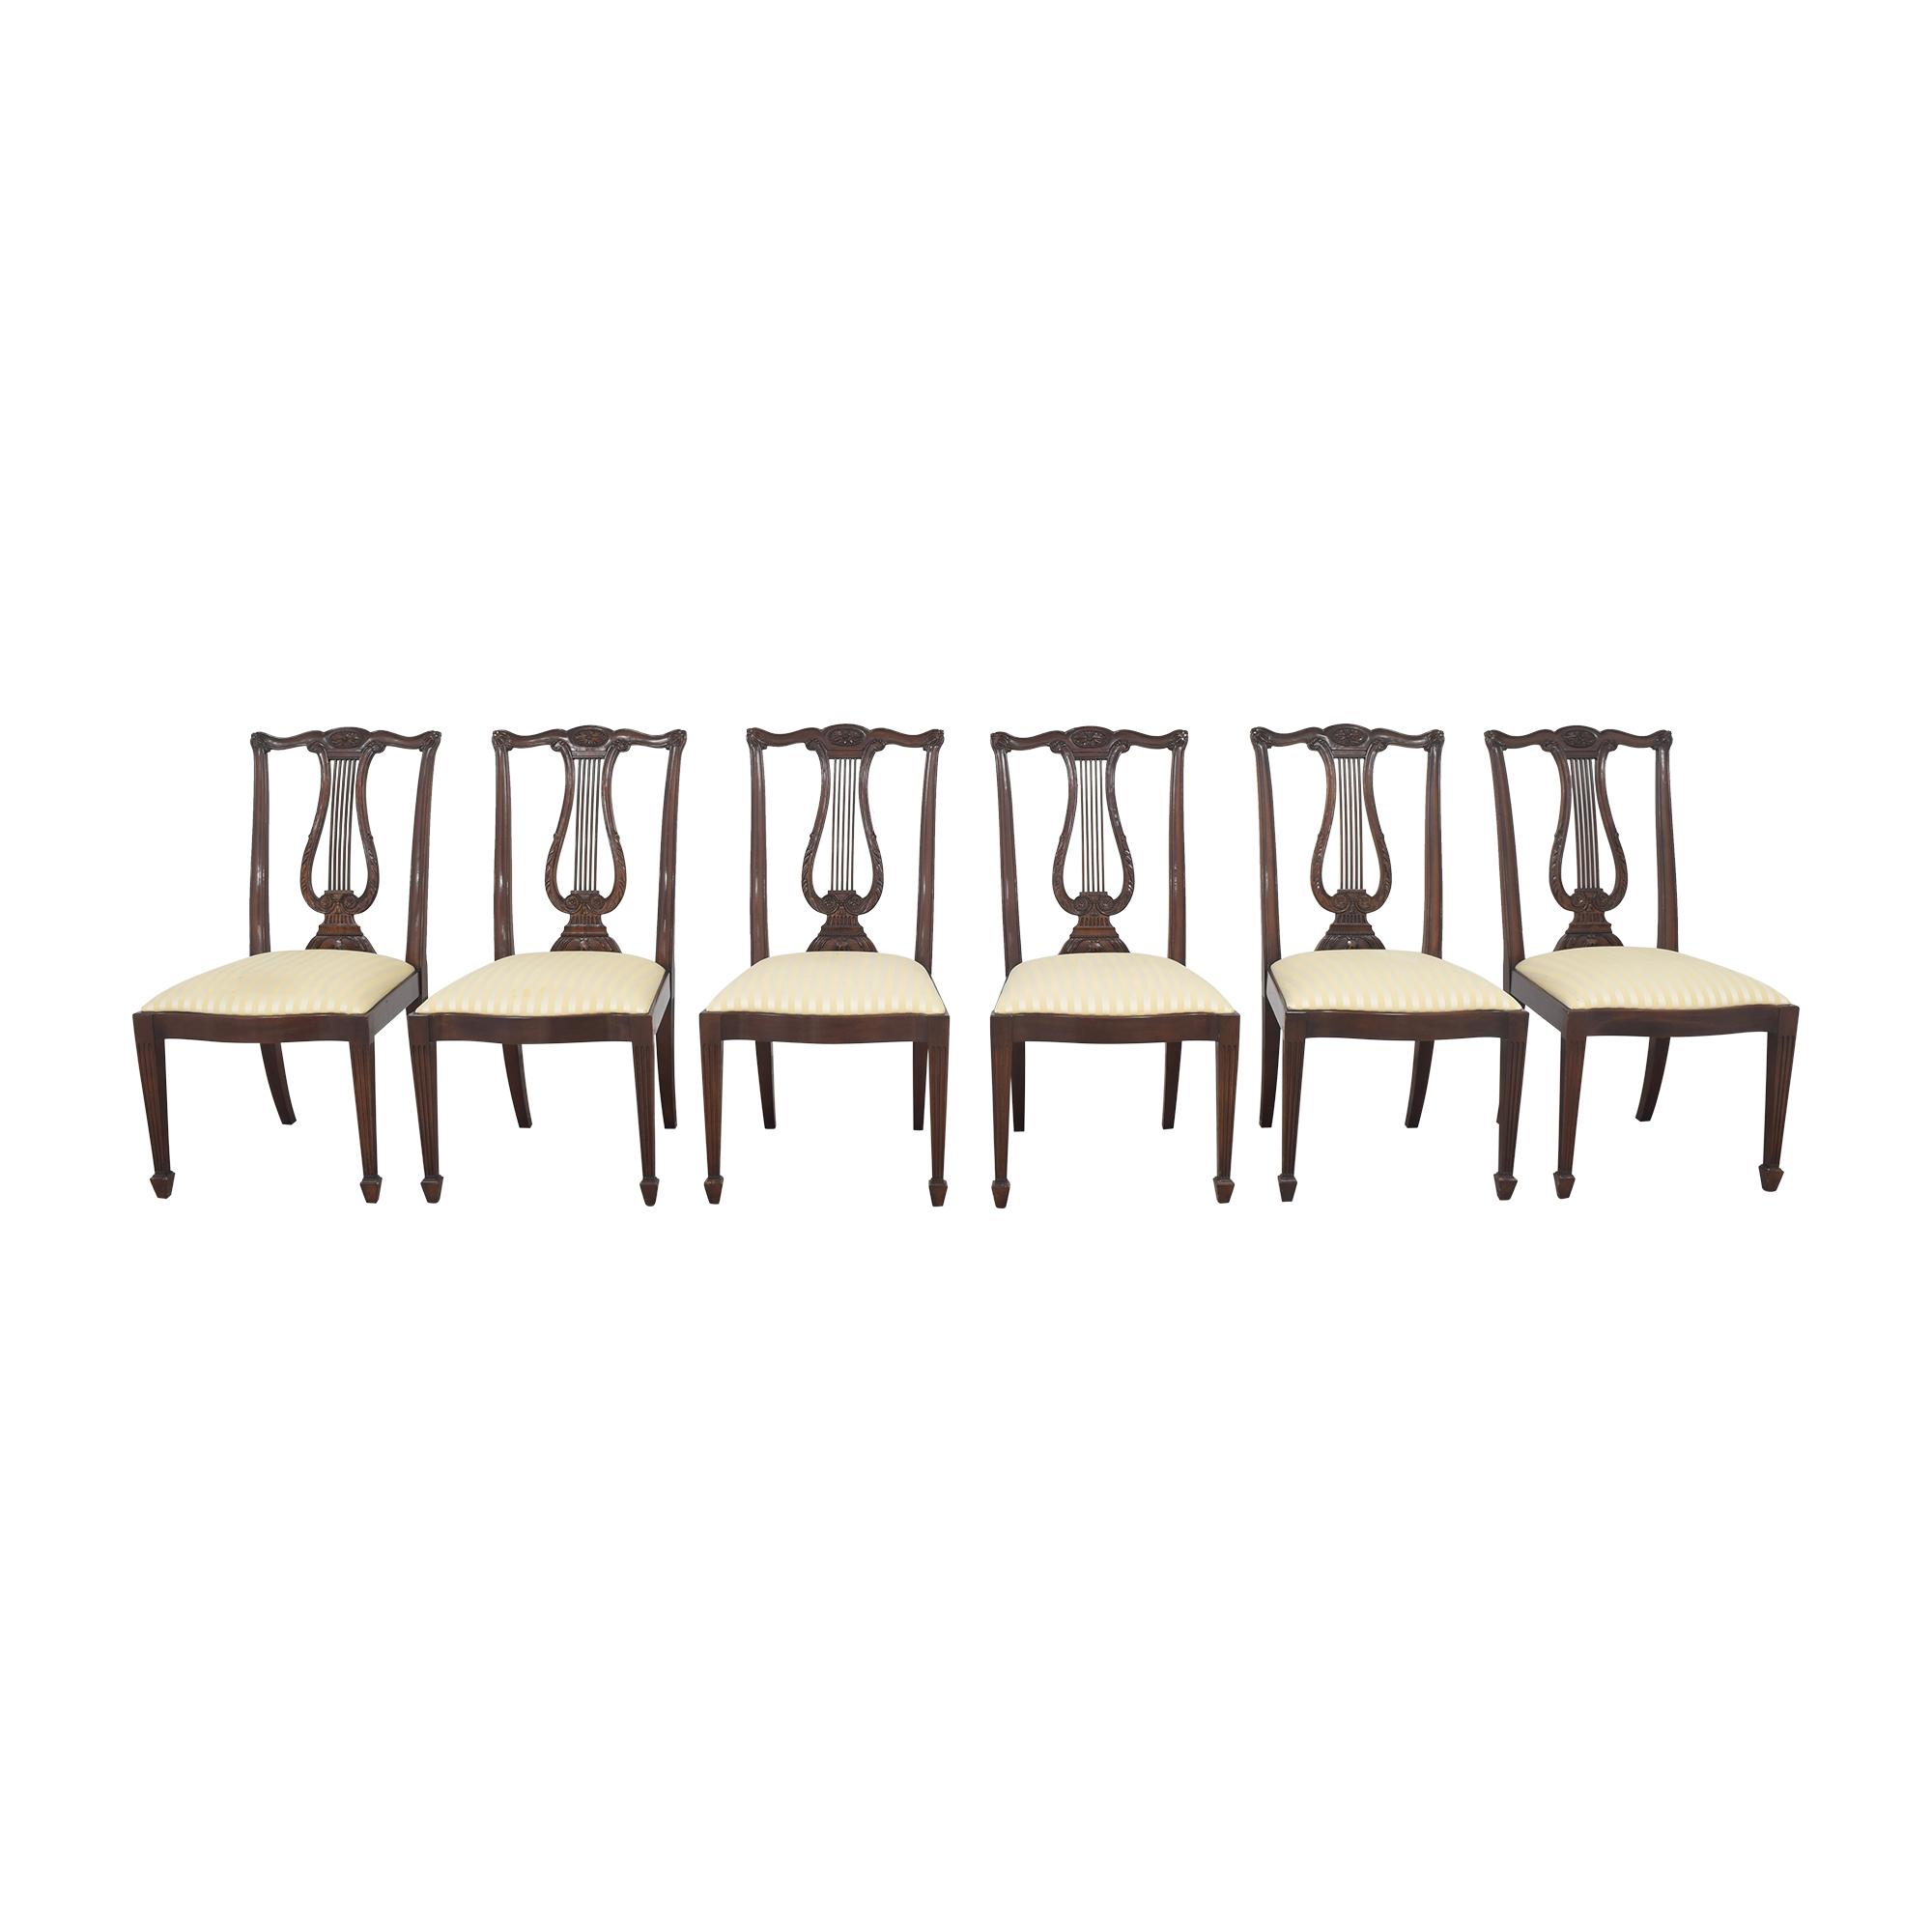 Henkel Harris Henkel Harris Lyre Back Dining Chairs coupon